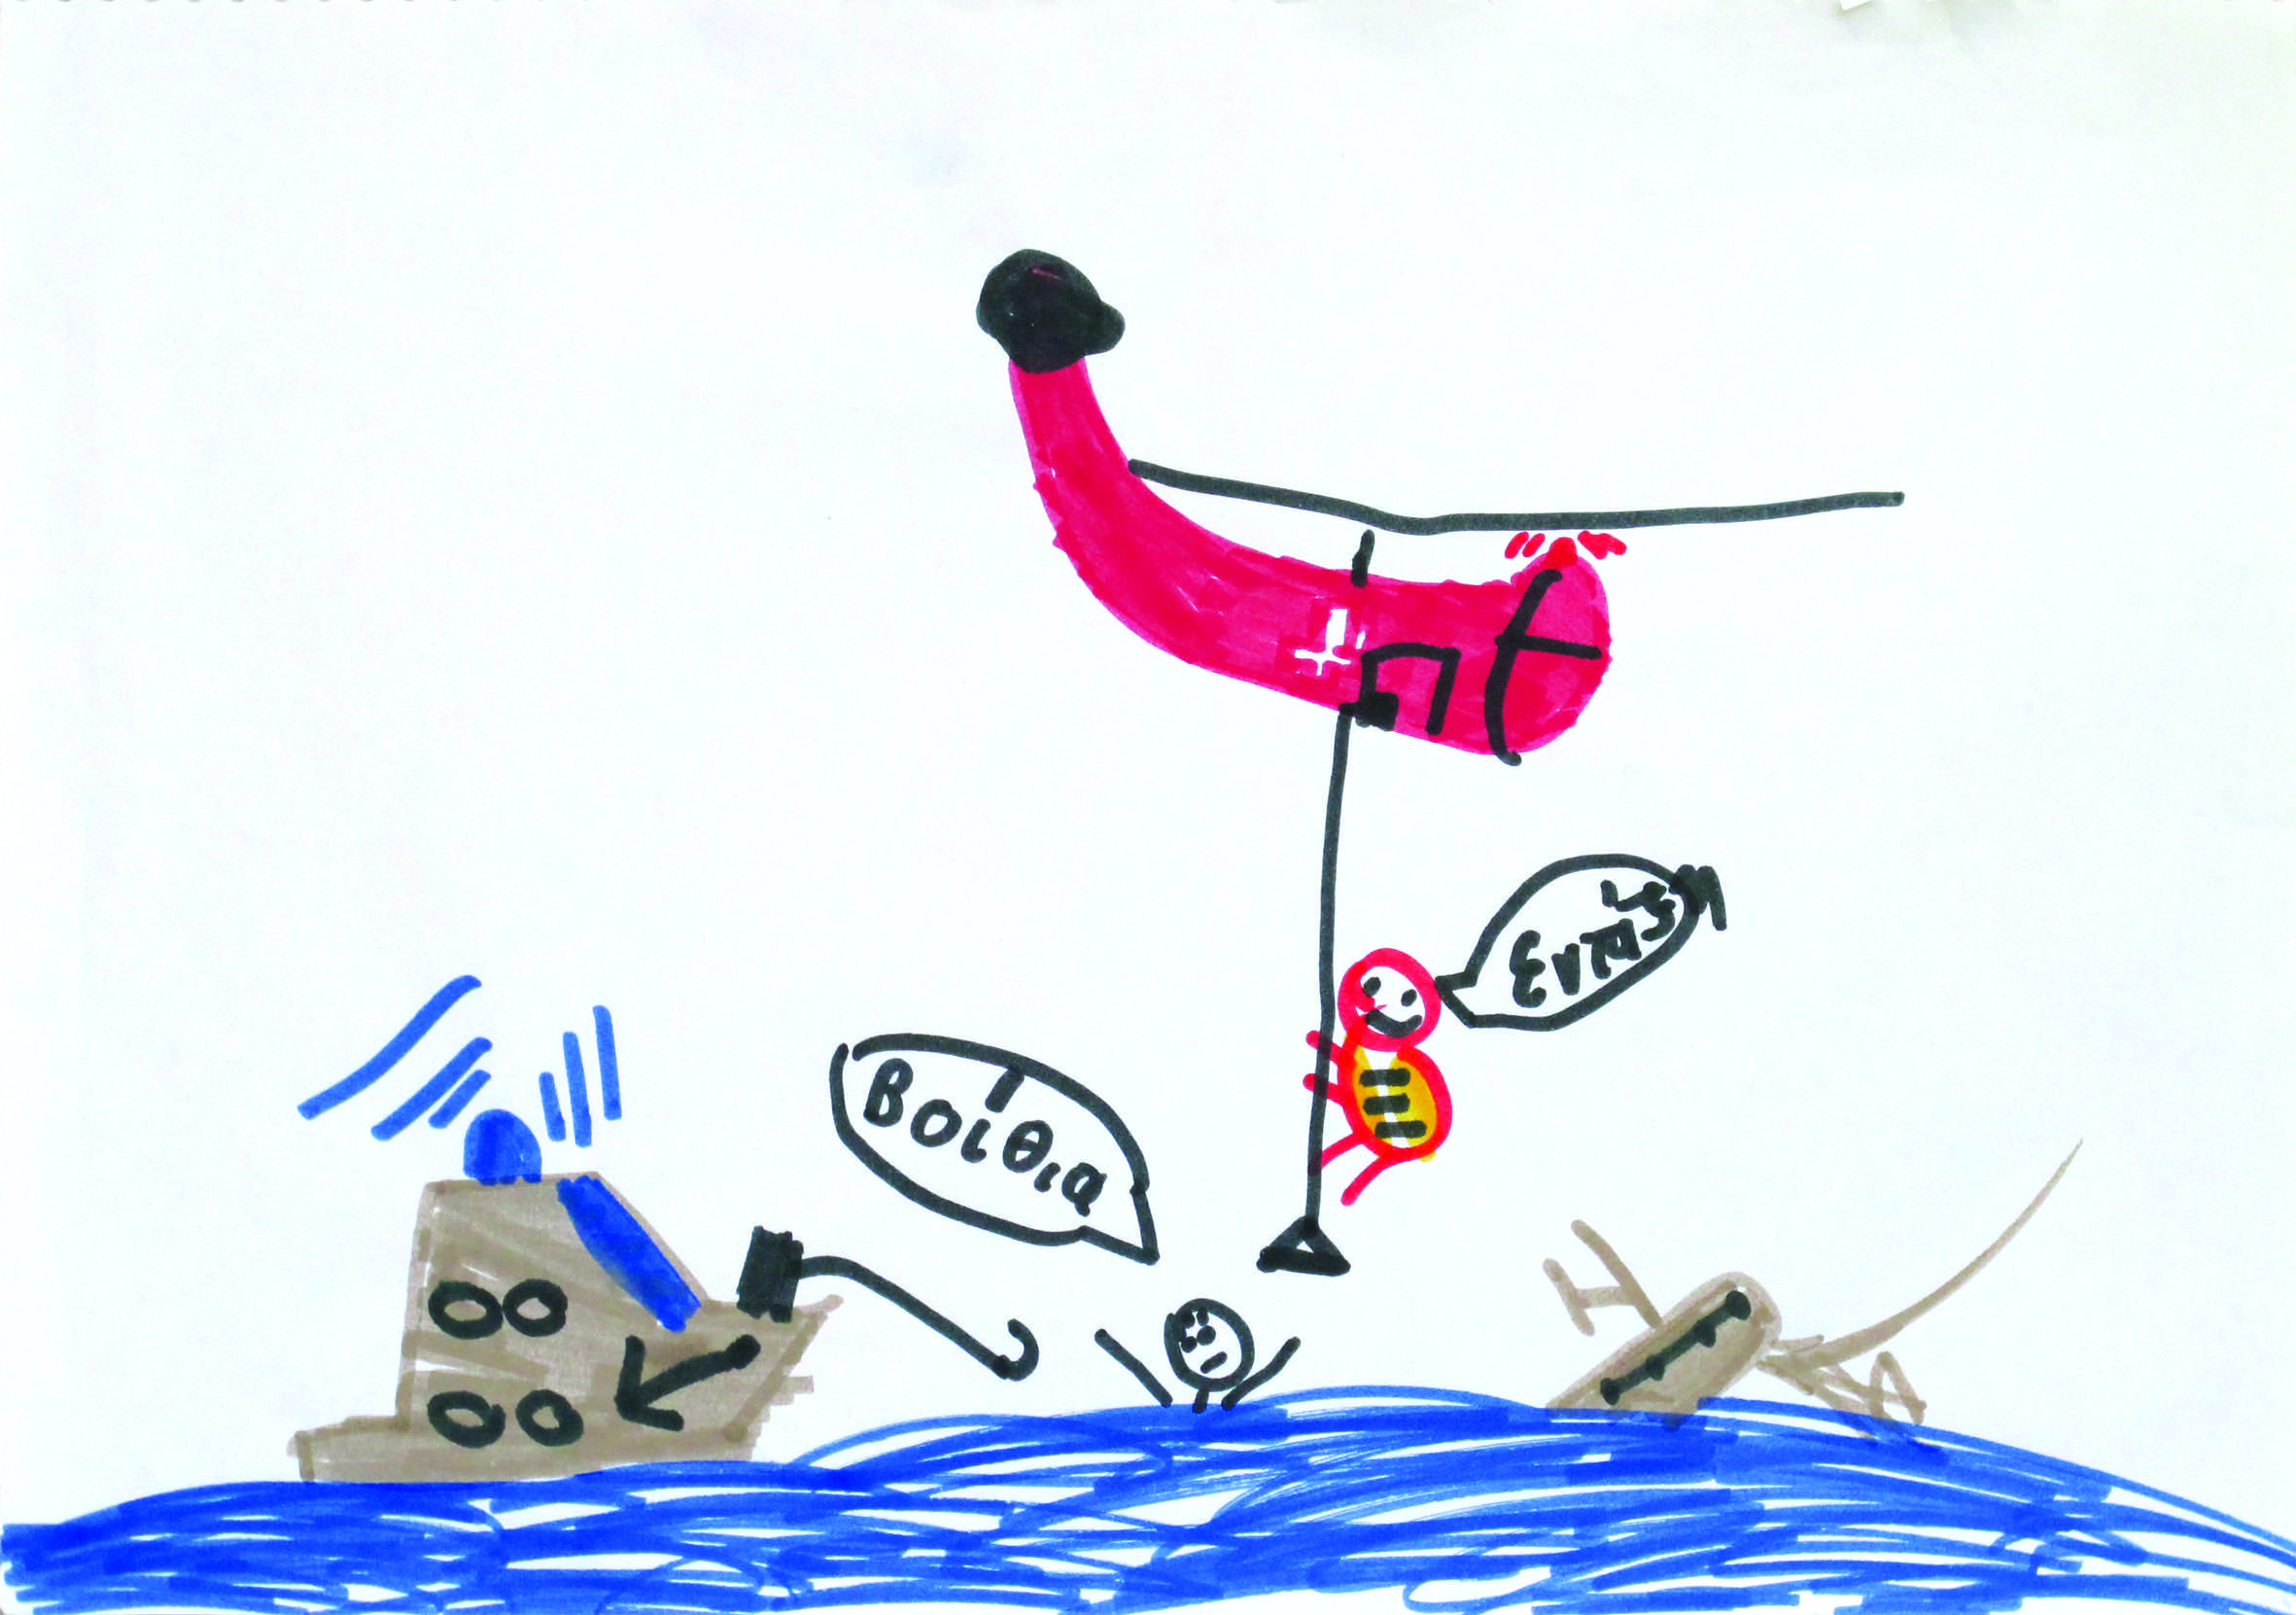 Shipwreck Suicide